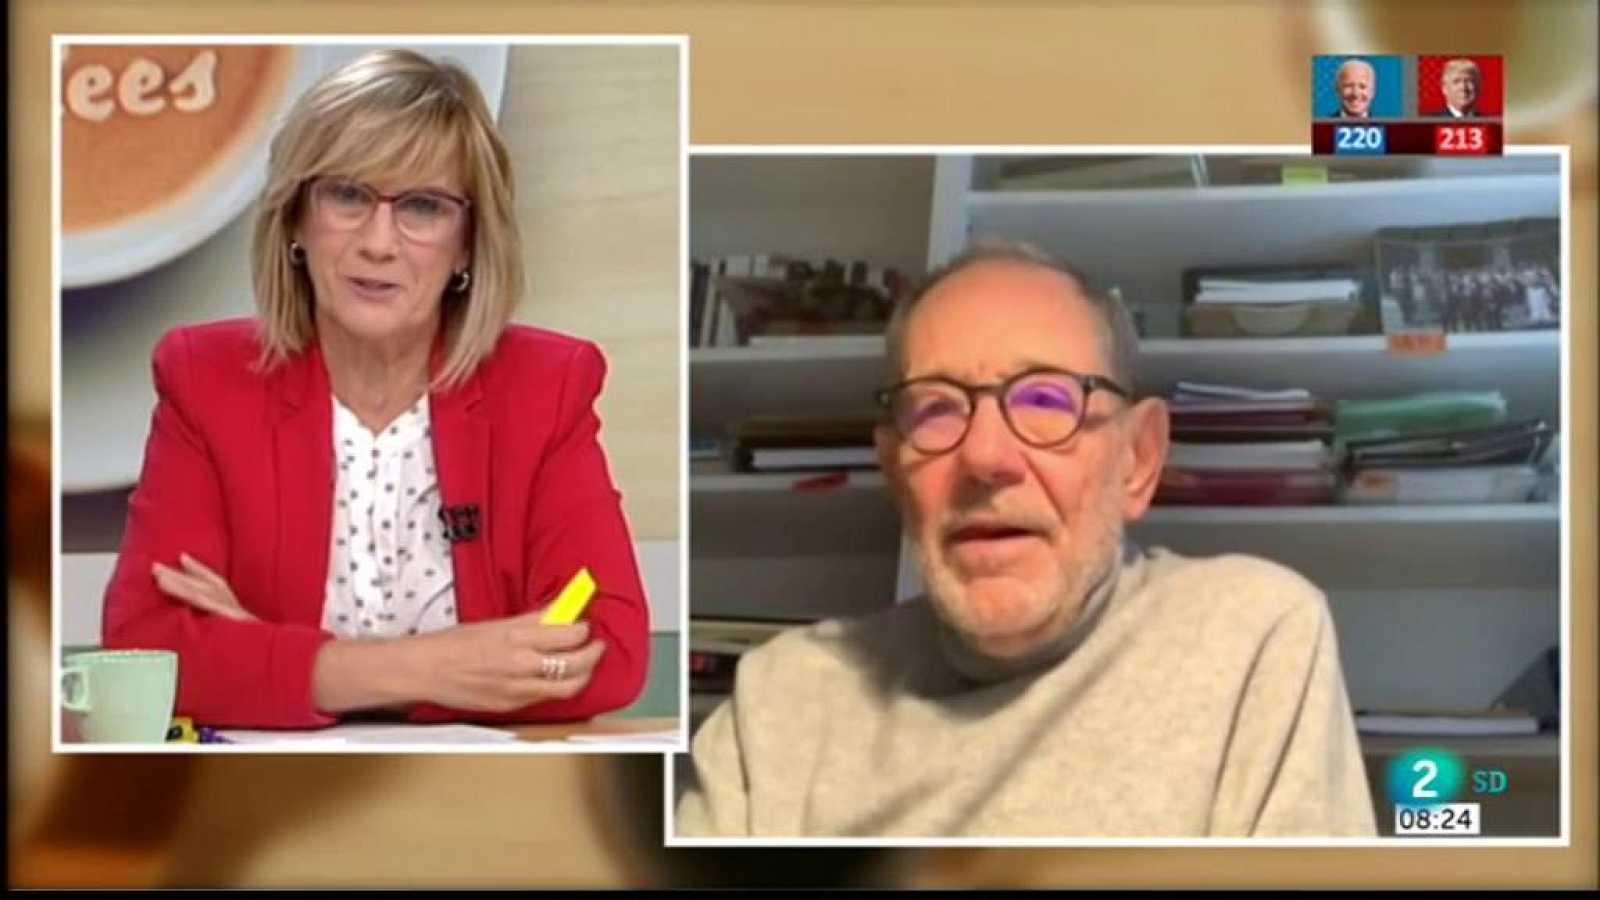 Gemma Nierga entrevista Javier Solana, exsecretari general de l'OTAN